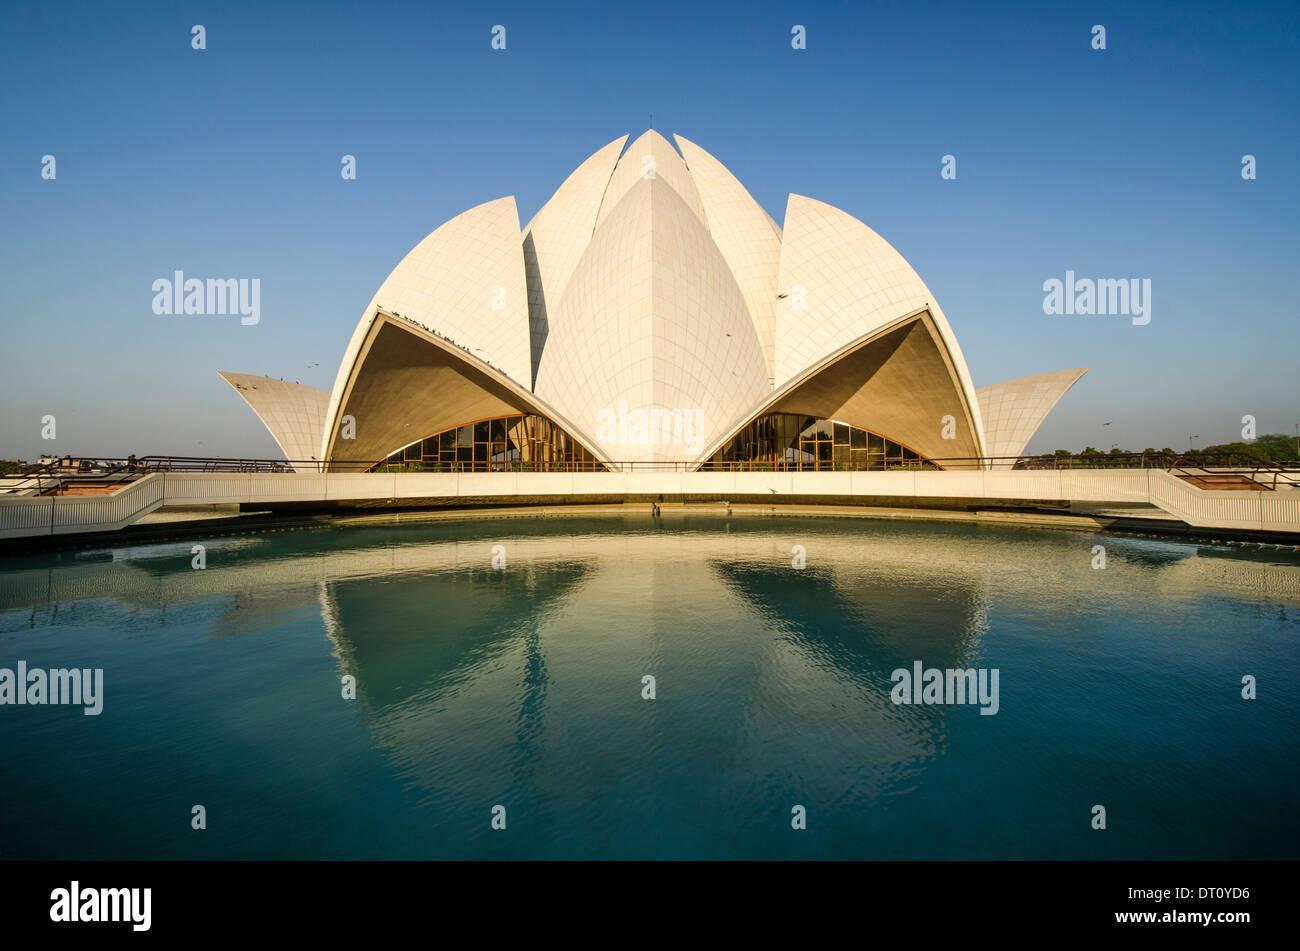 Lotus temple New Delhi - Stock Image